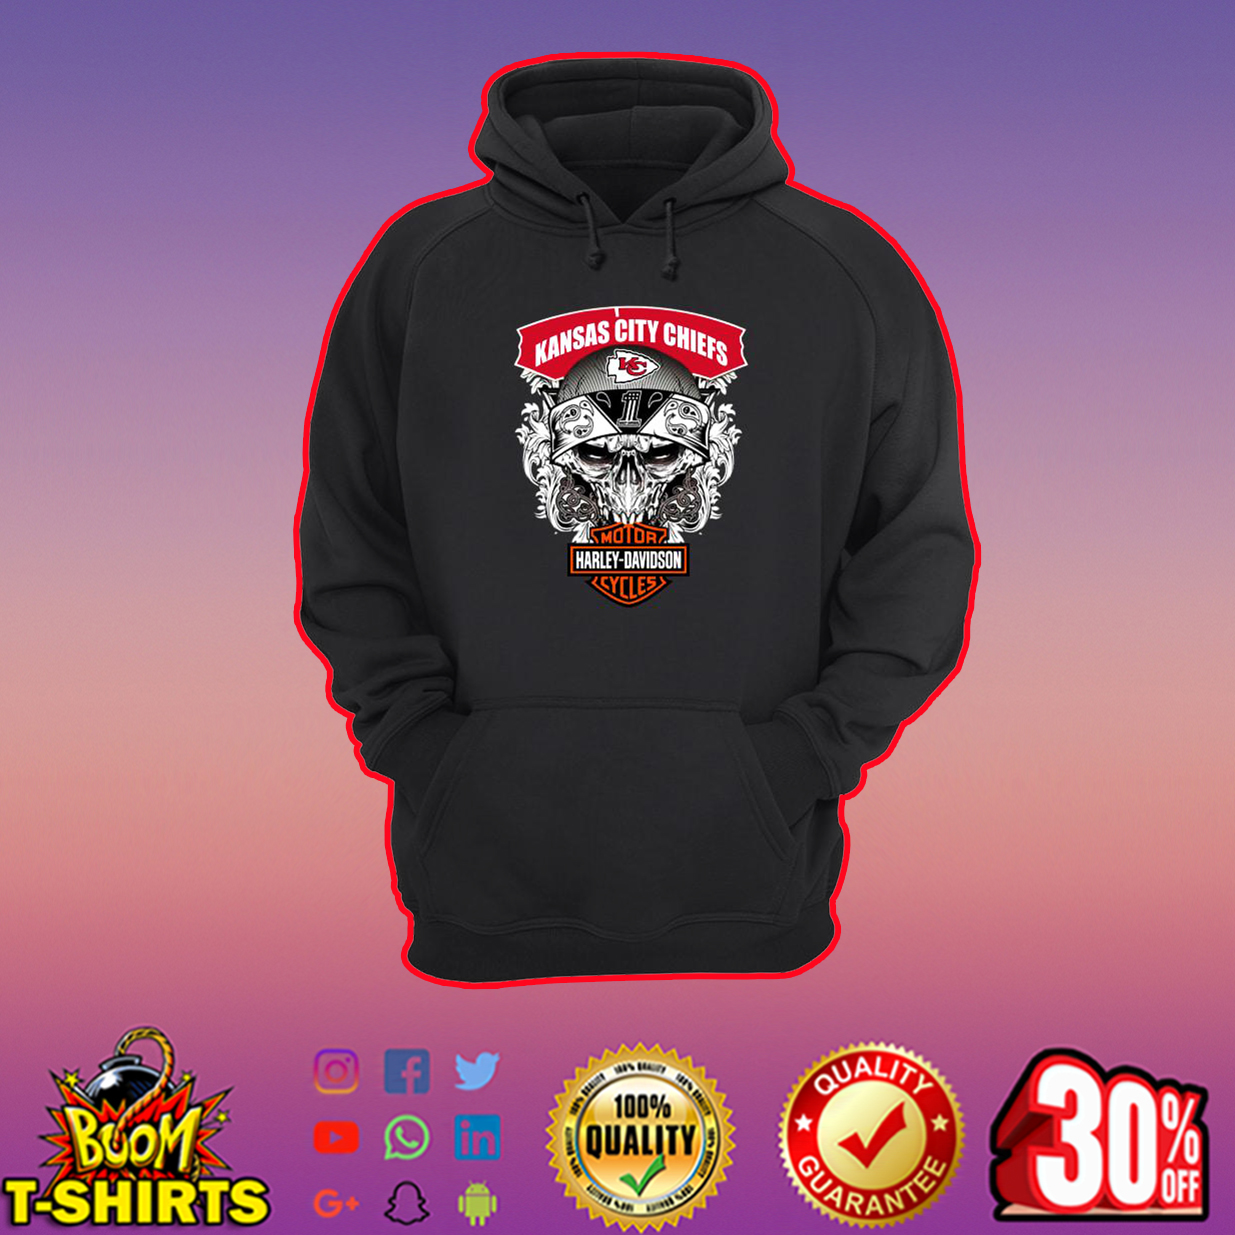 Kansas City Chiefs Motor Harley Davidson hoodie